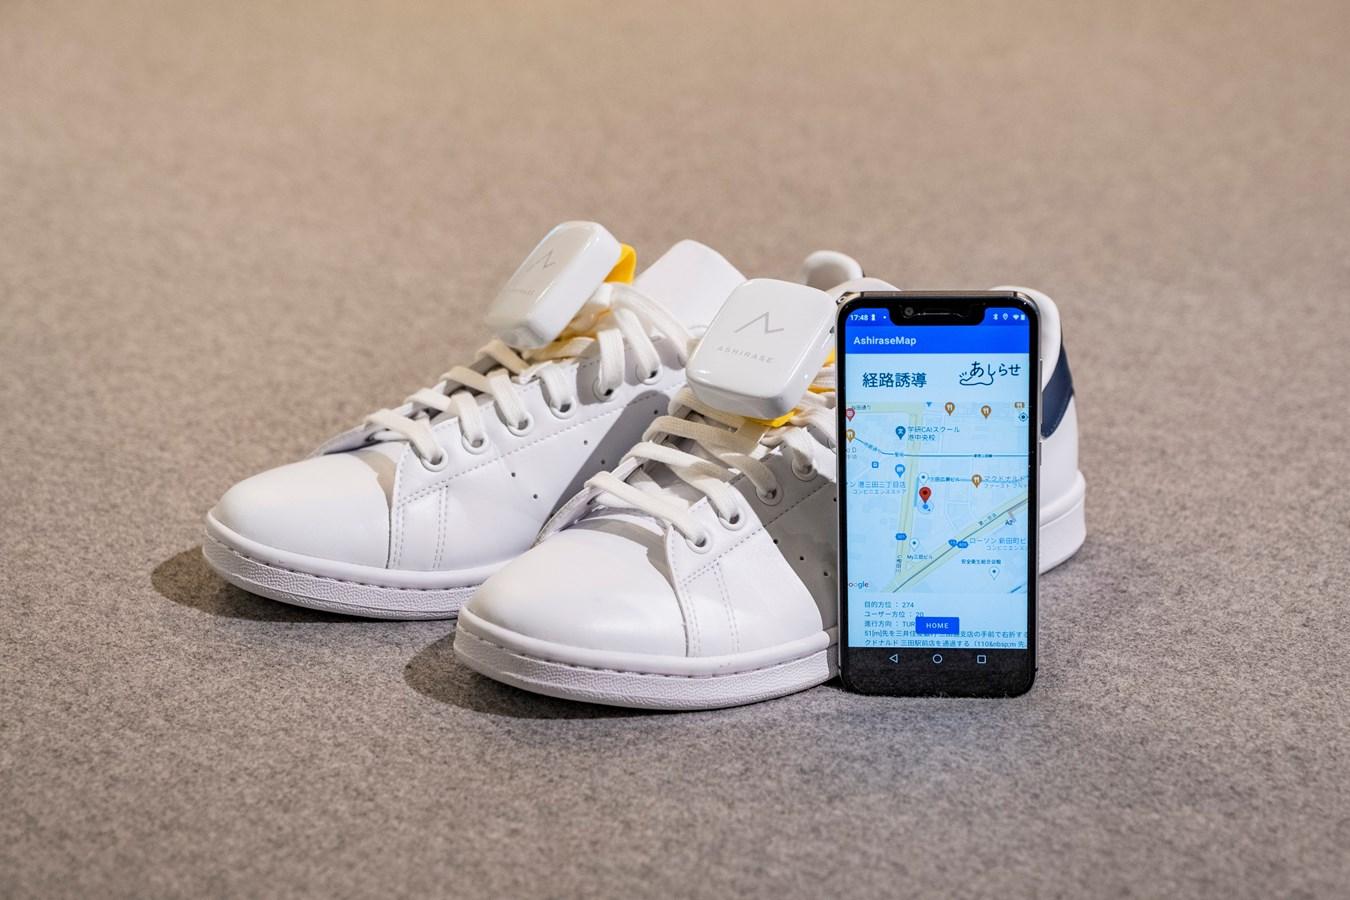 333261 Ashirase vibration device attached to shoes and Ashirase smartphone app Ashirace : Η νεότερη startup της Honda, φέρνει μία καινοτομία για τα άτομα με προβλήματα όρασης Honda, ειδήσεις, καινοτομία, Νέα